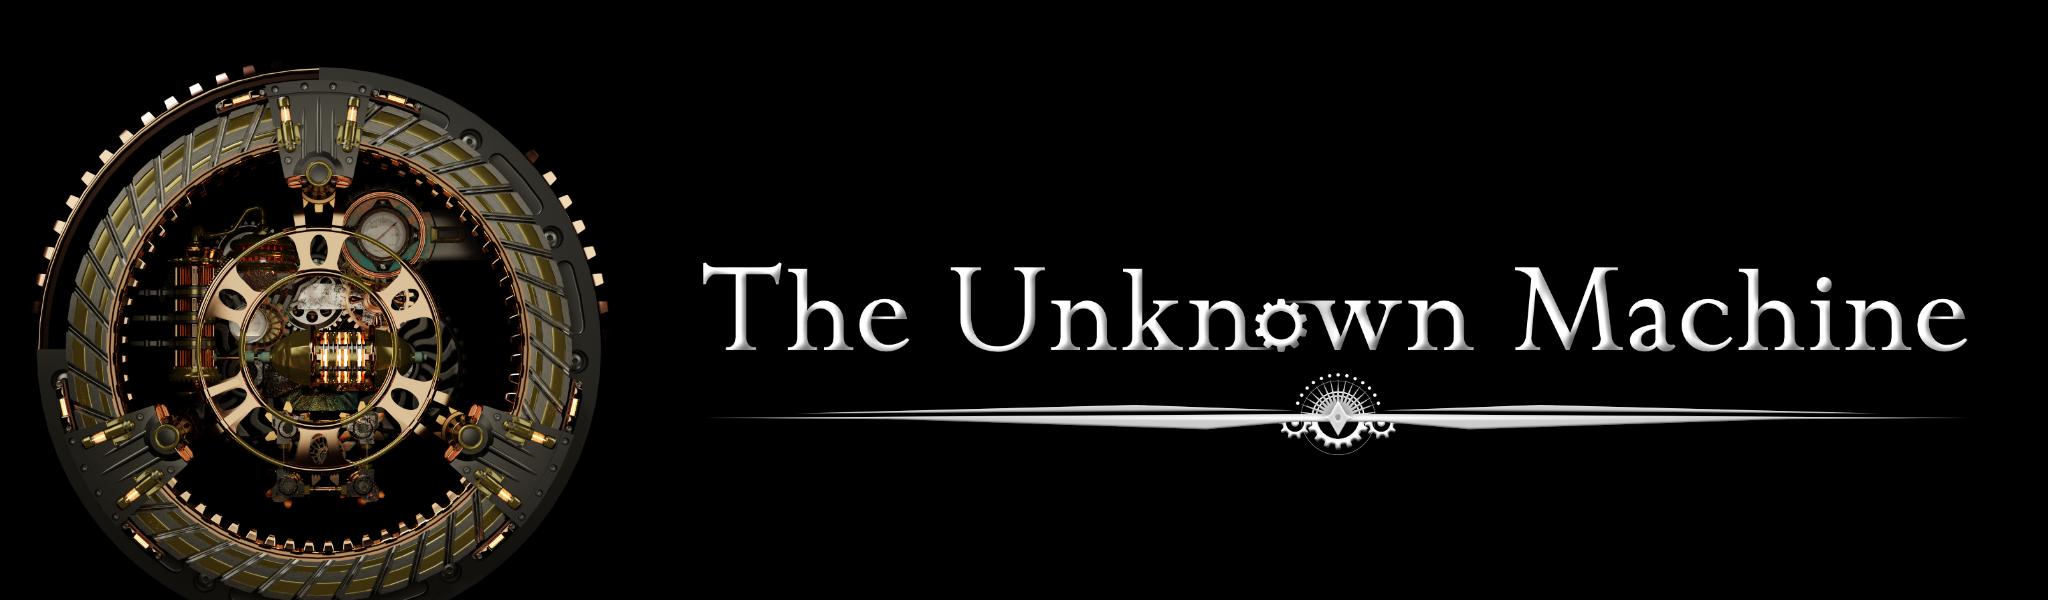 The Unknown Machine